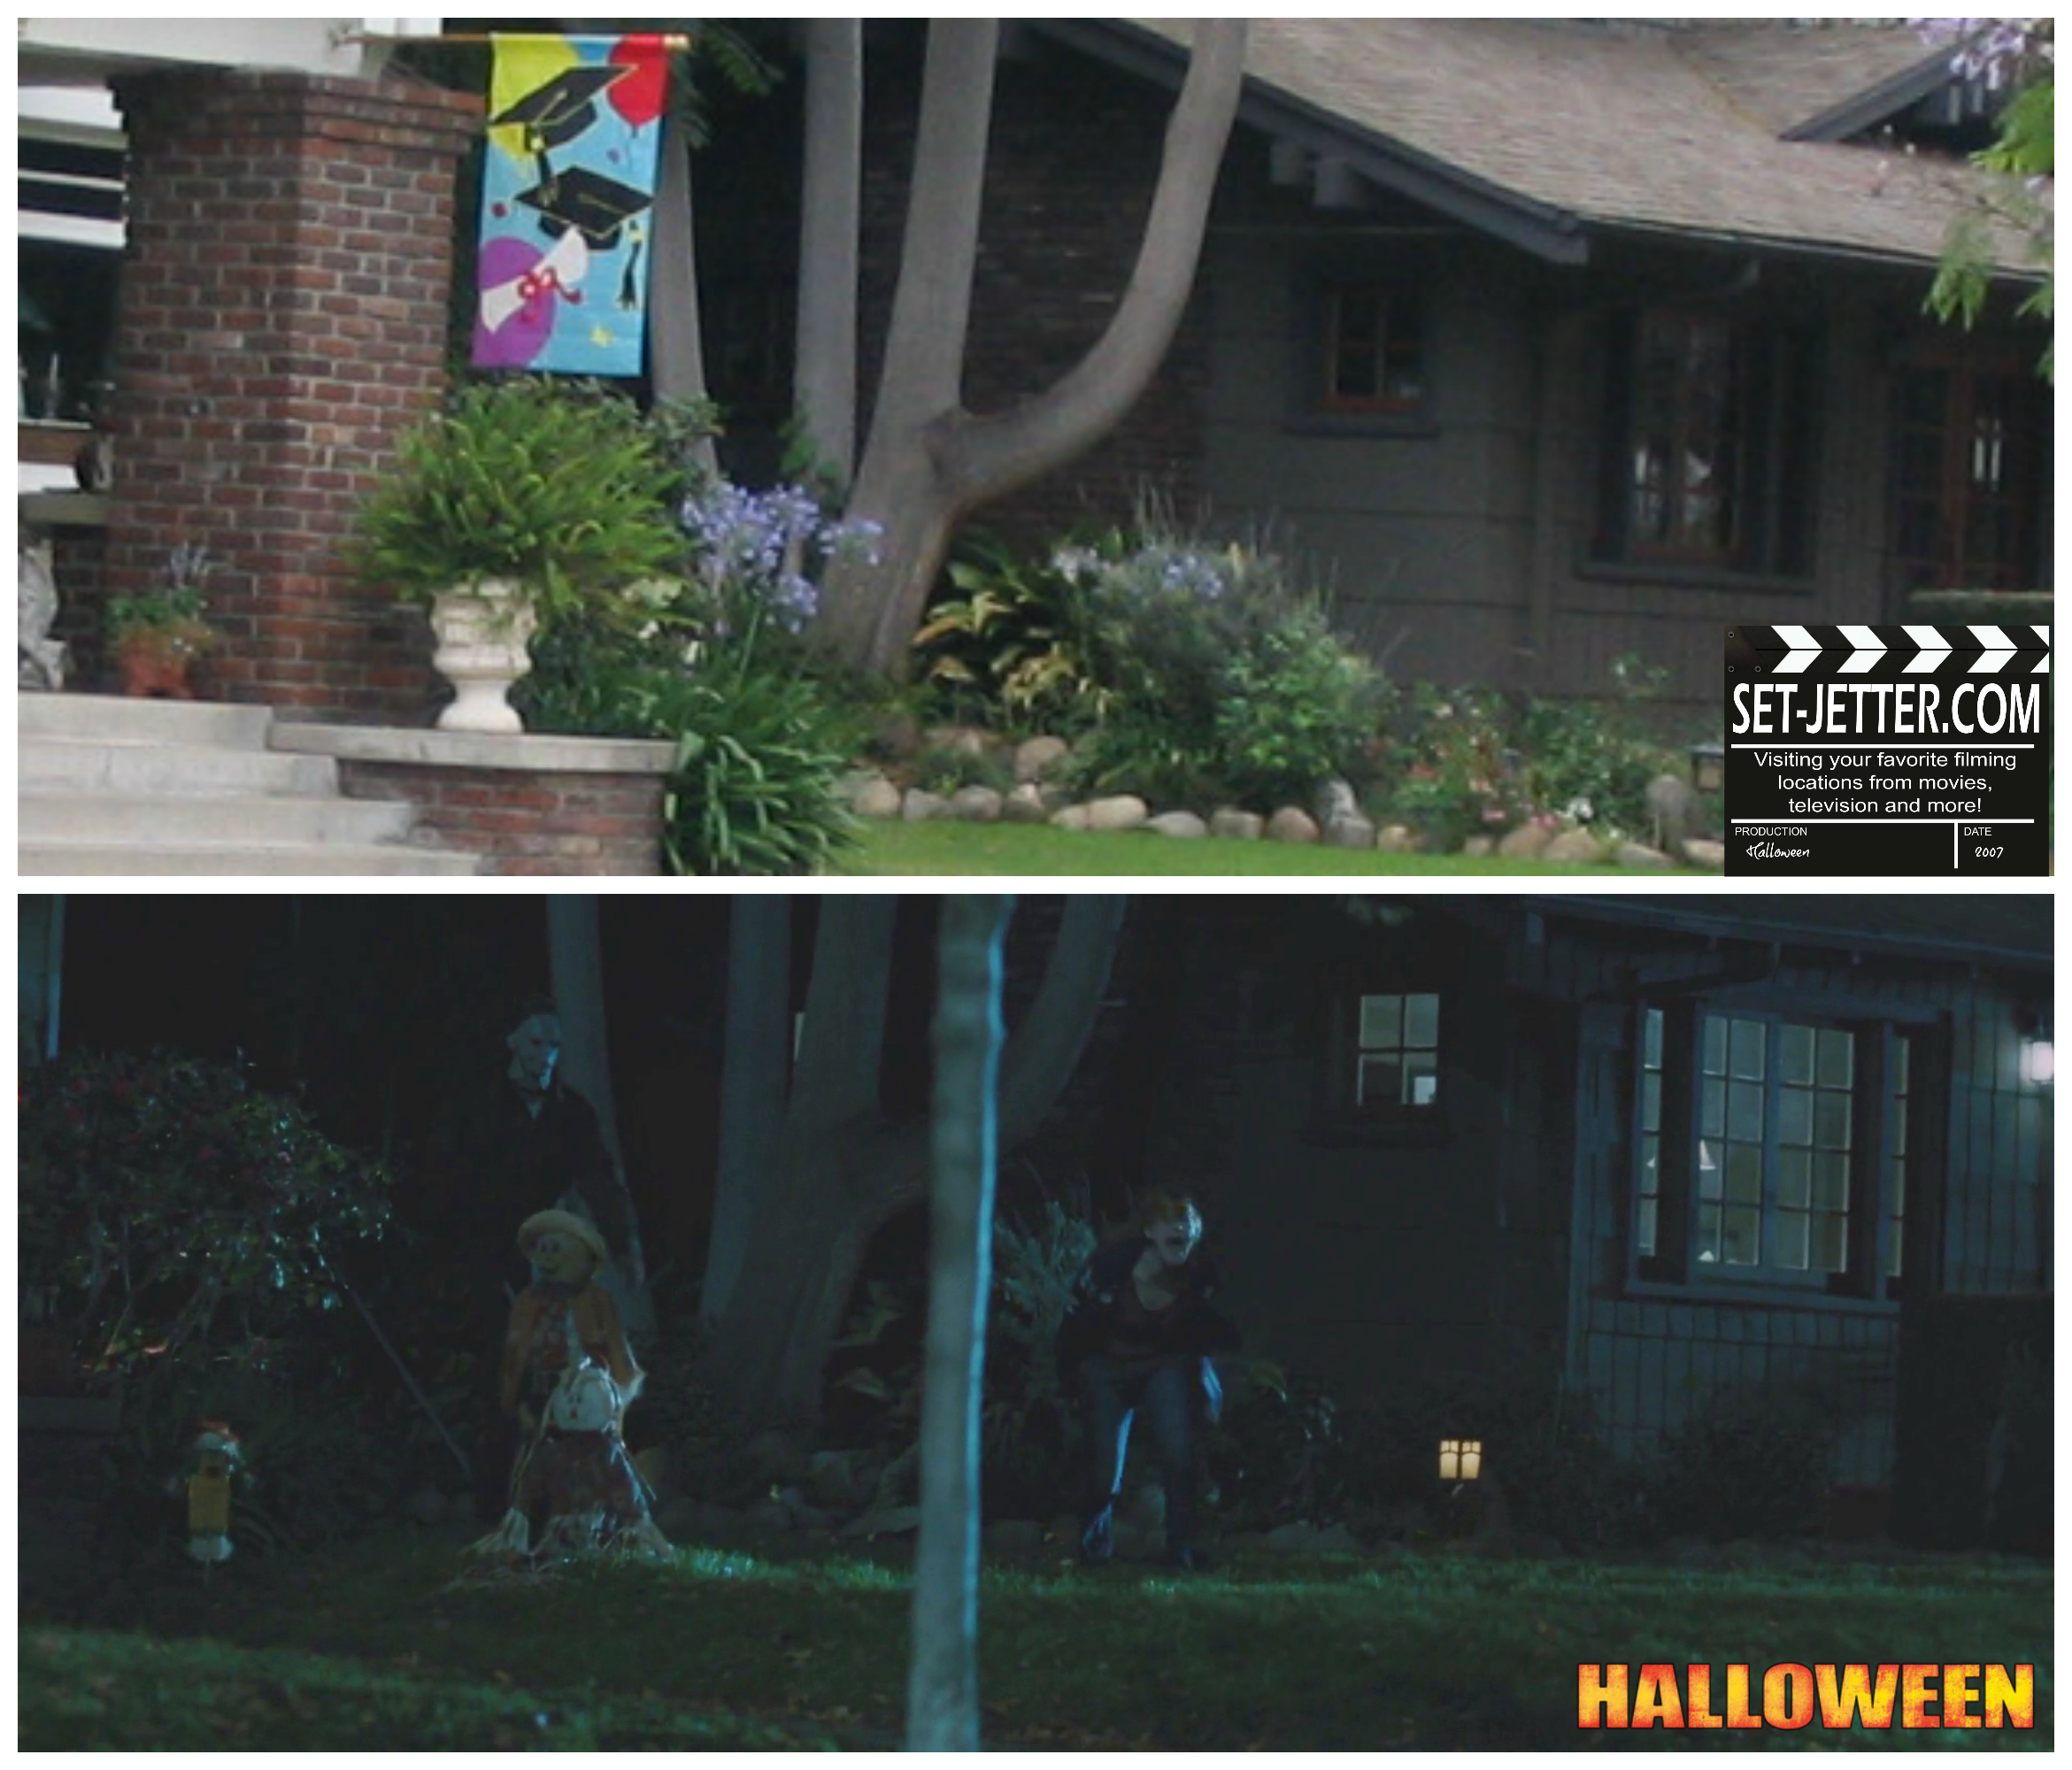 Halloween 2007 comparison 66.jpg